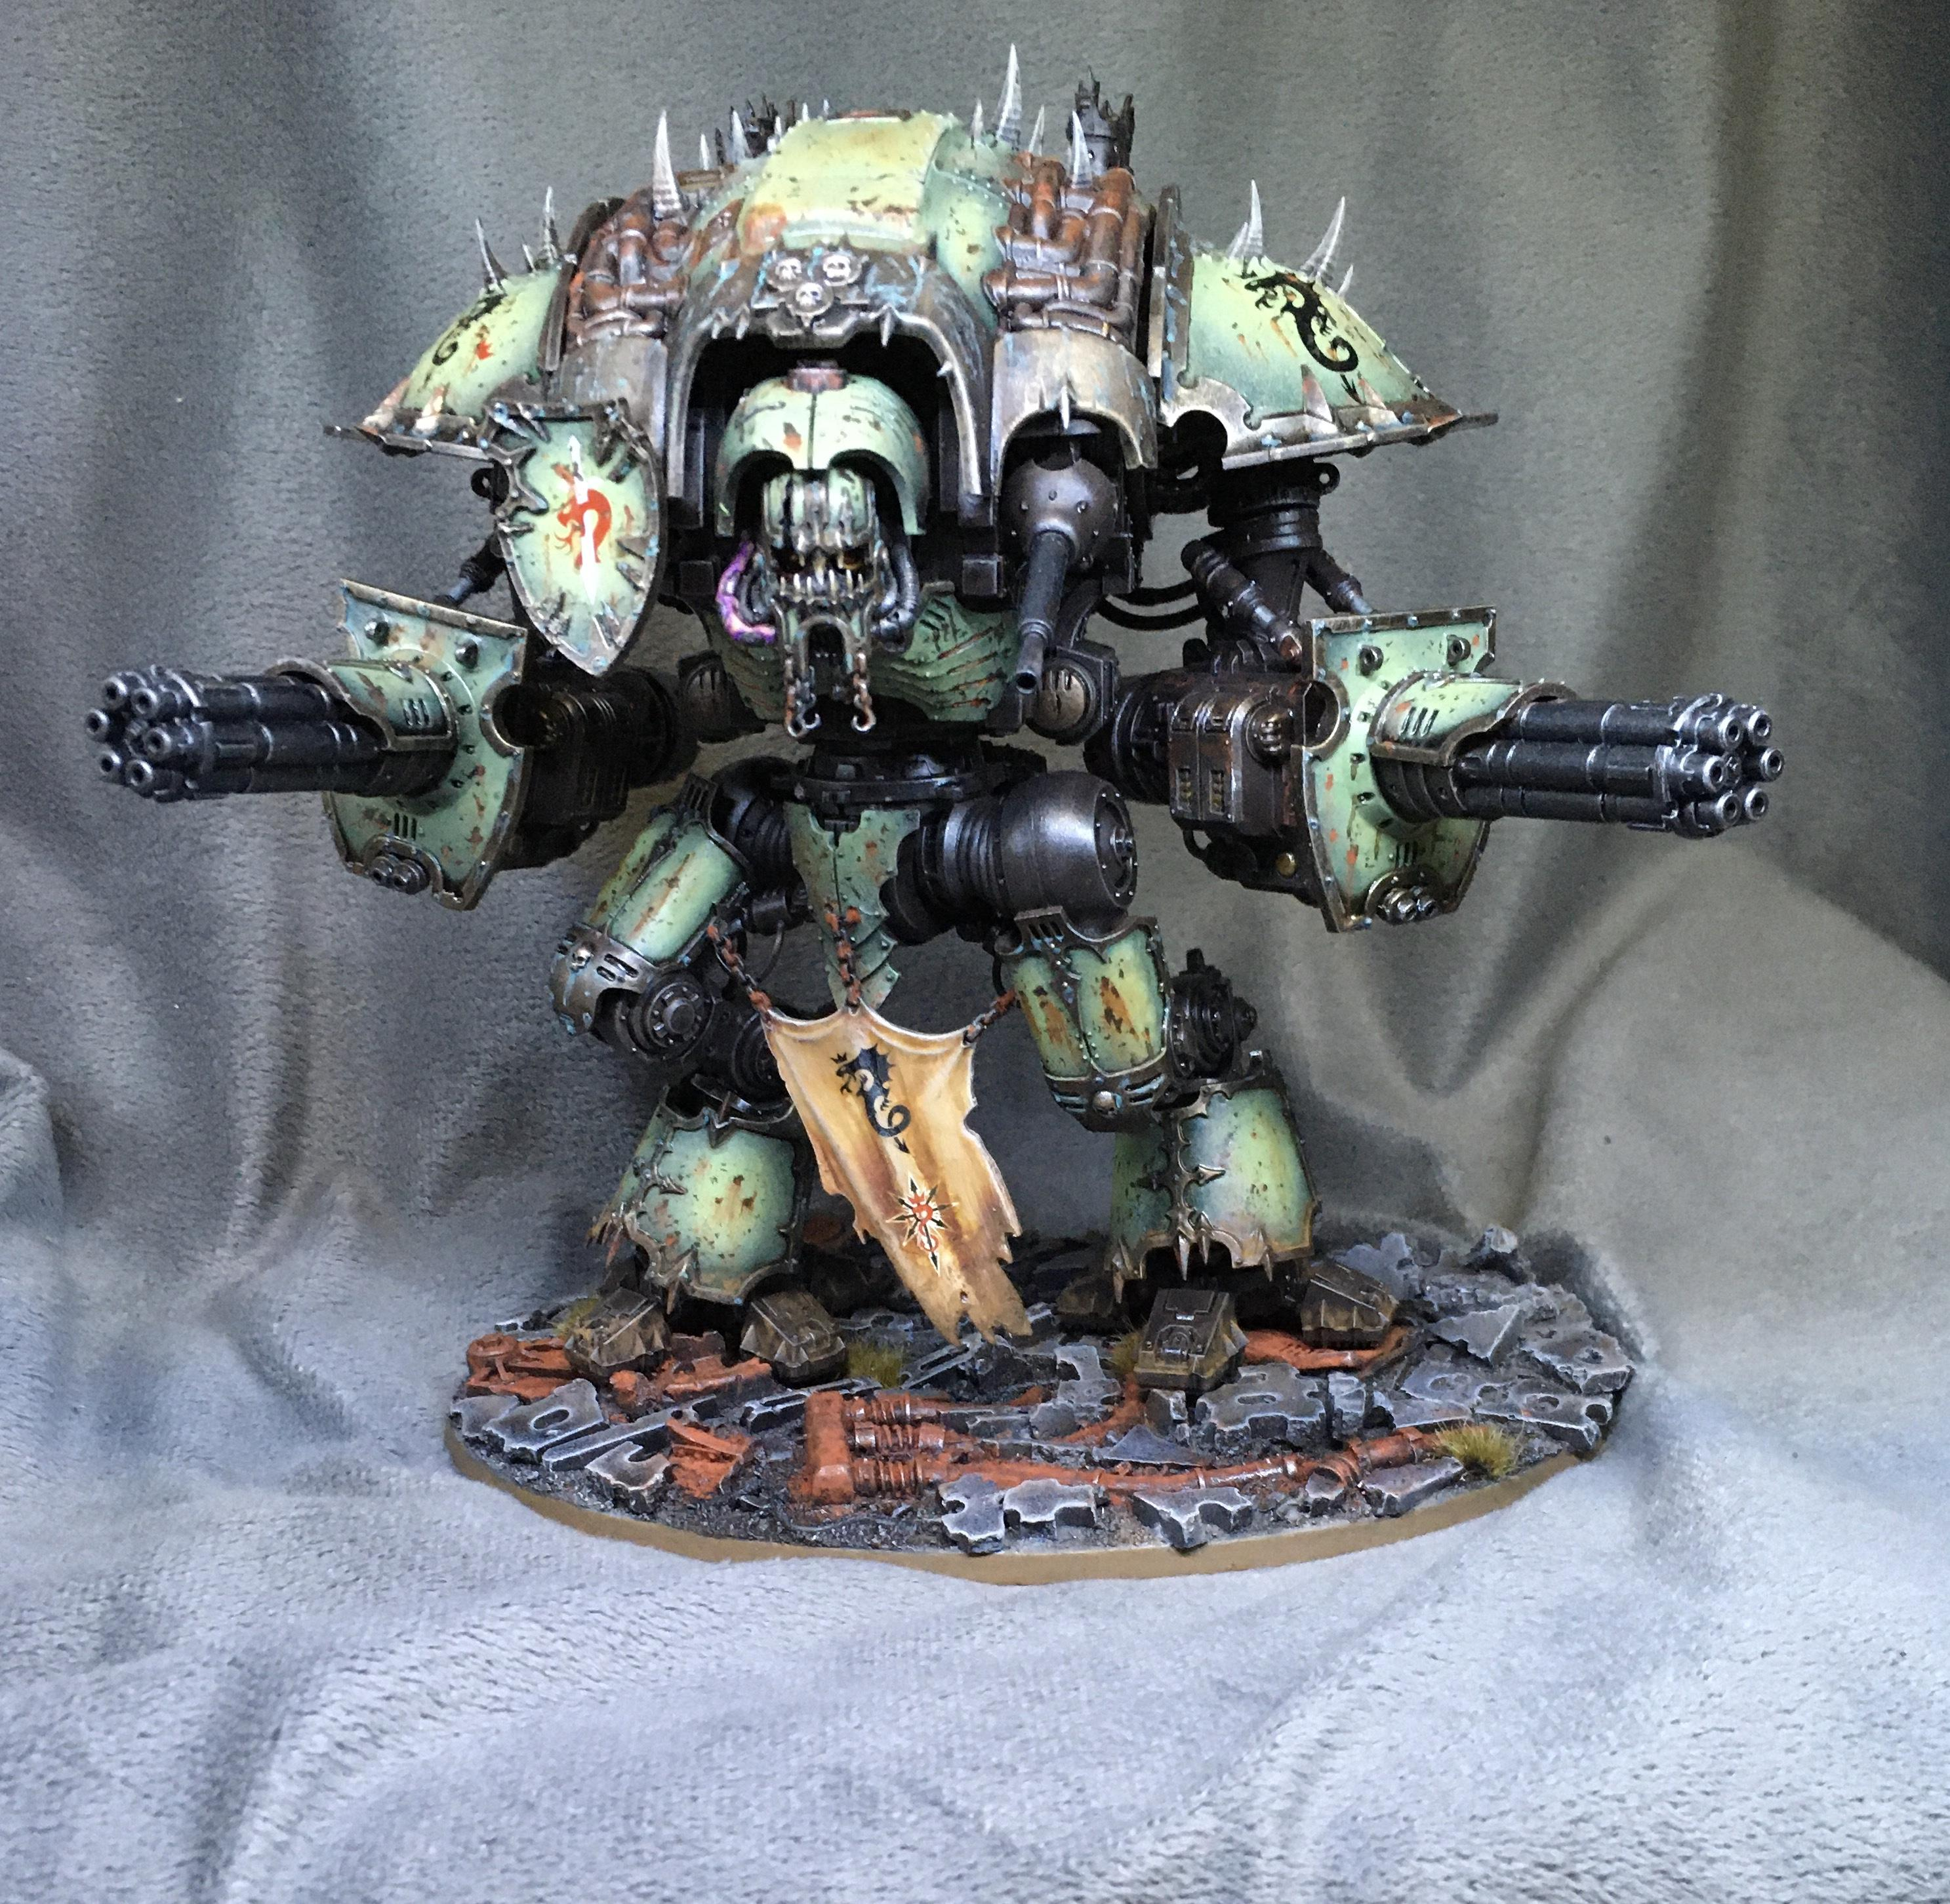 Chaos, Chaos Knight, Daemons, Infernal, Nurgle, Themed Base, Warhammer 40,000, Warhammer Fantasy